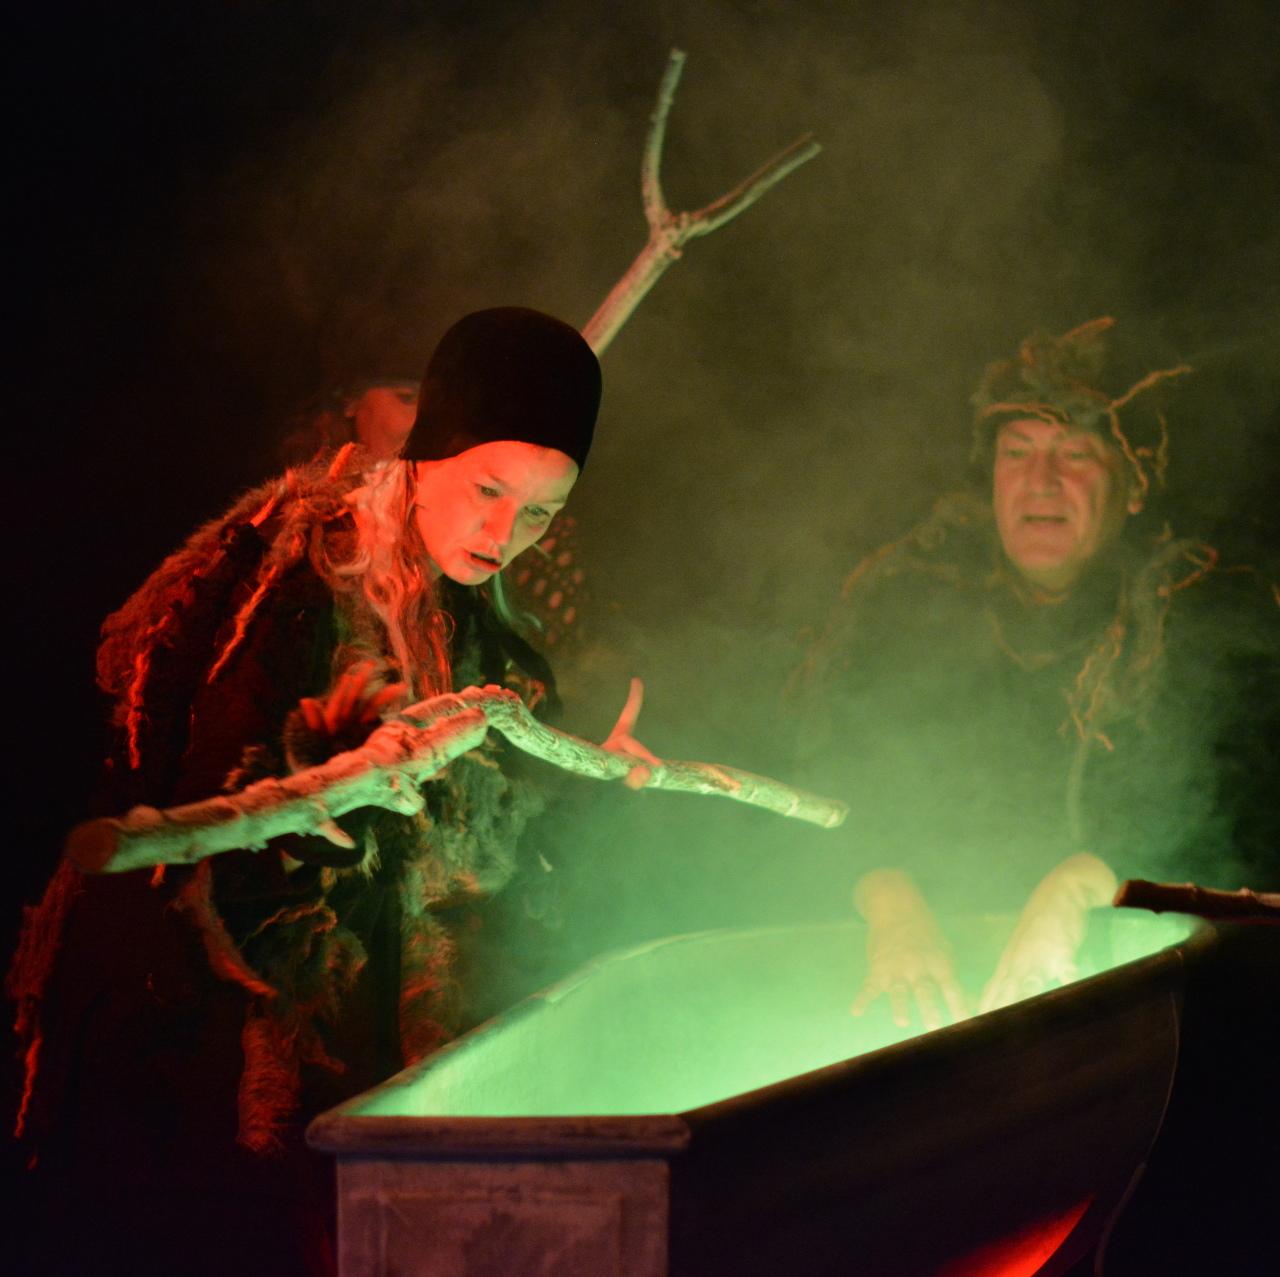 Hexenkessel mit Zaubertrank